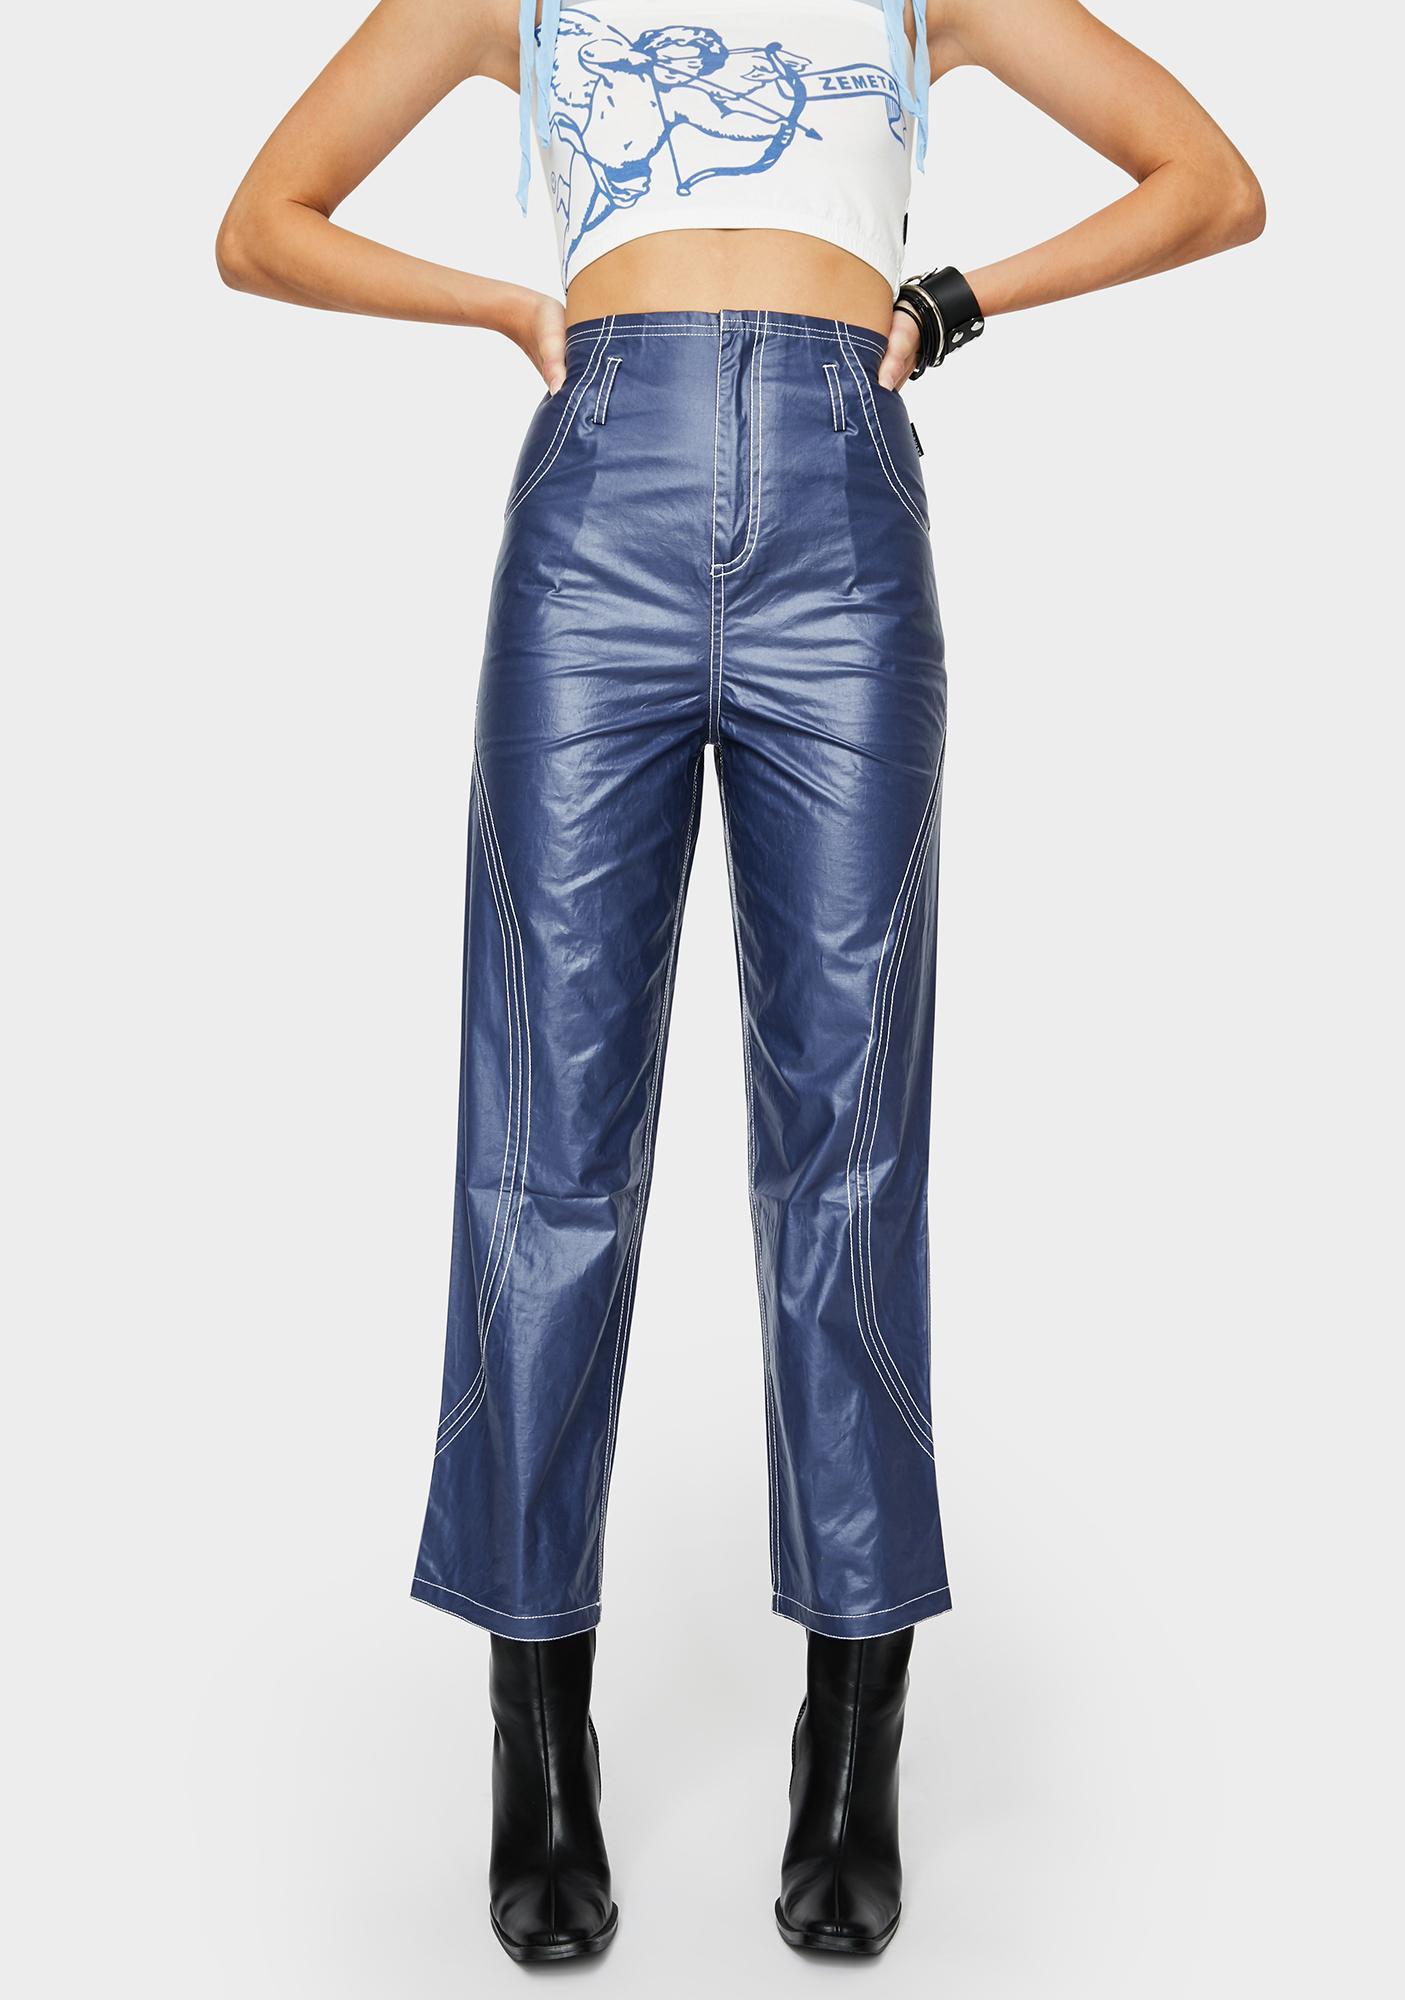 ZEMETA Navy Glossy High Waist Pants